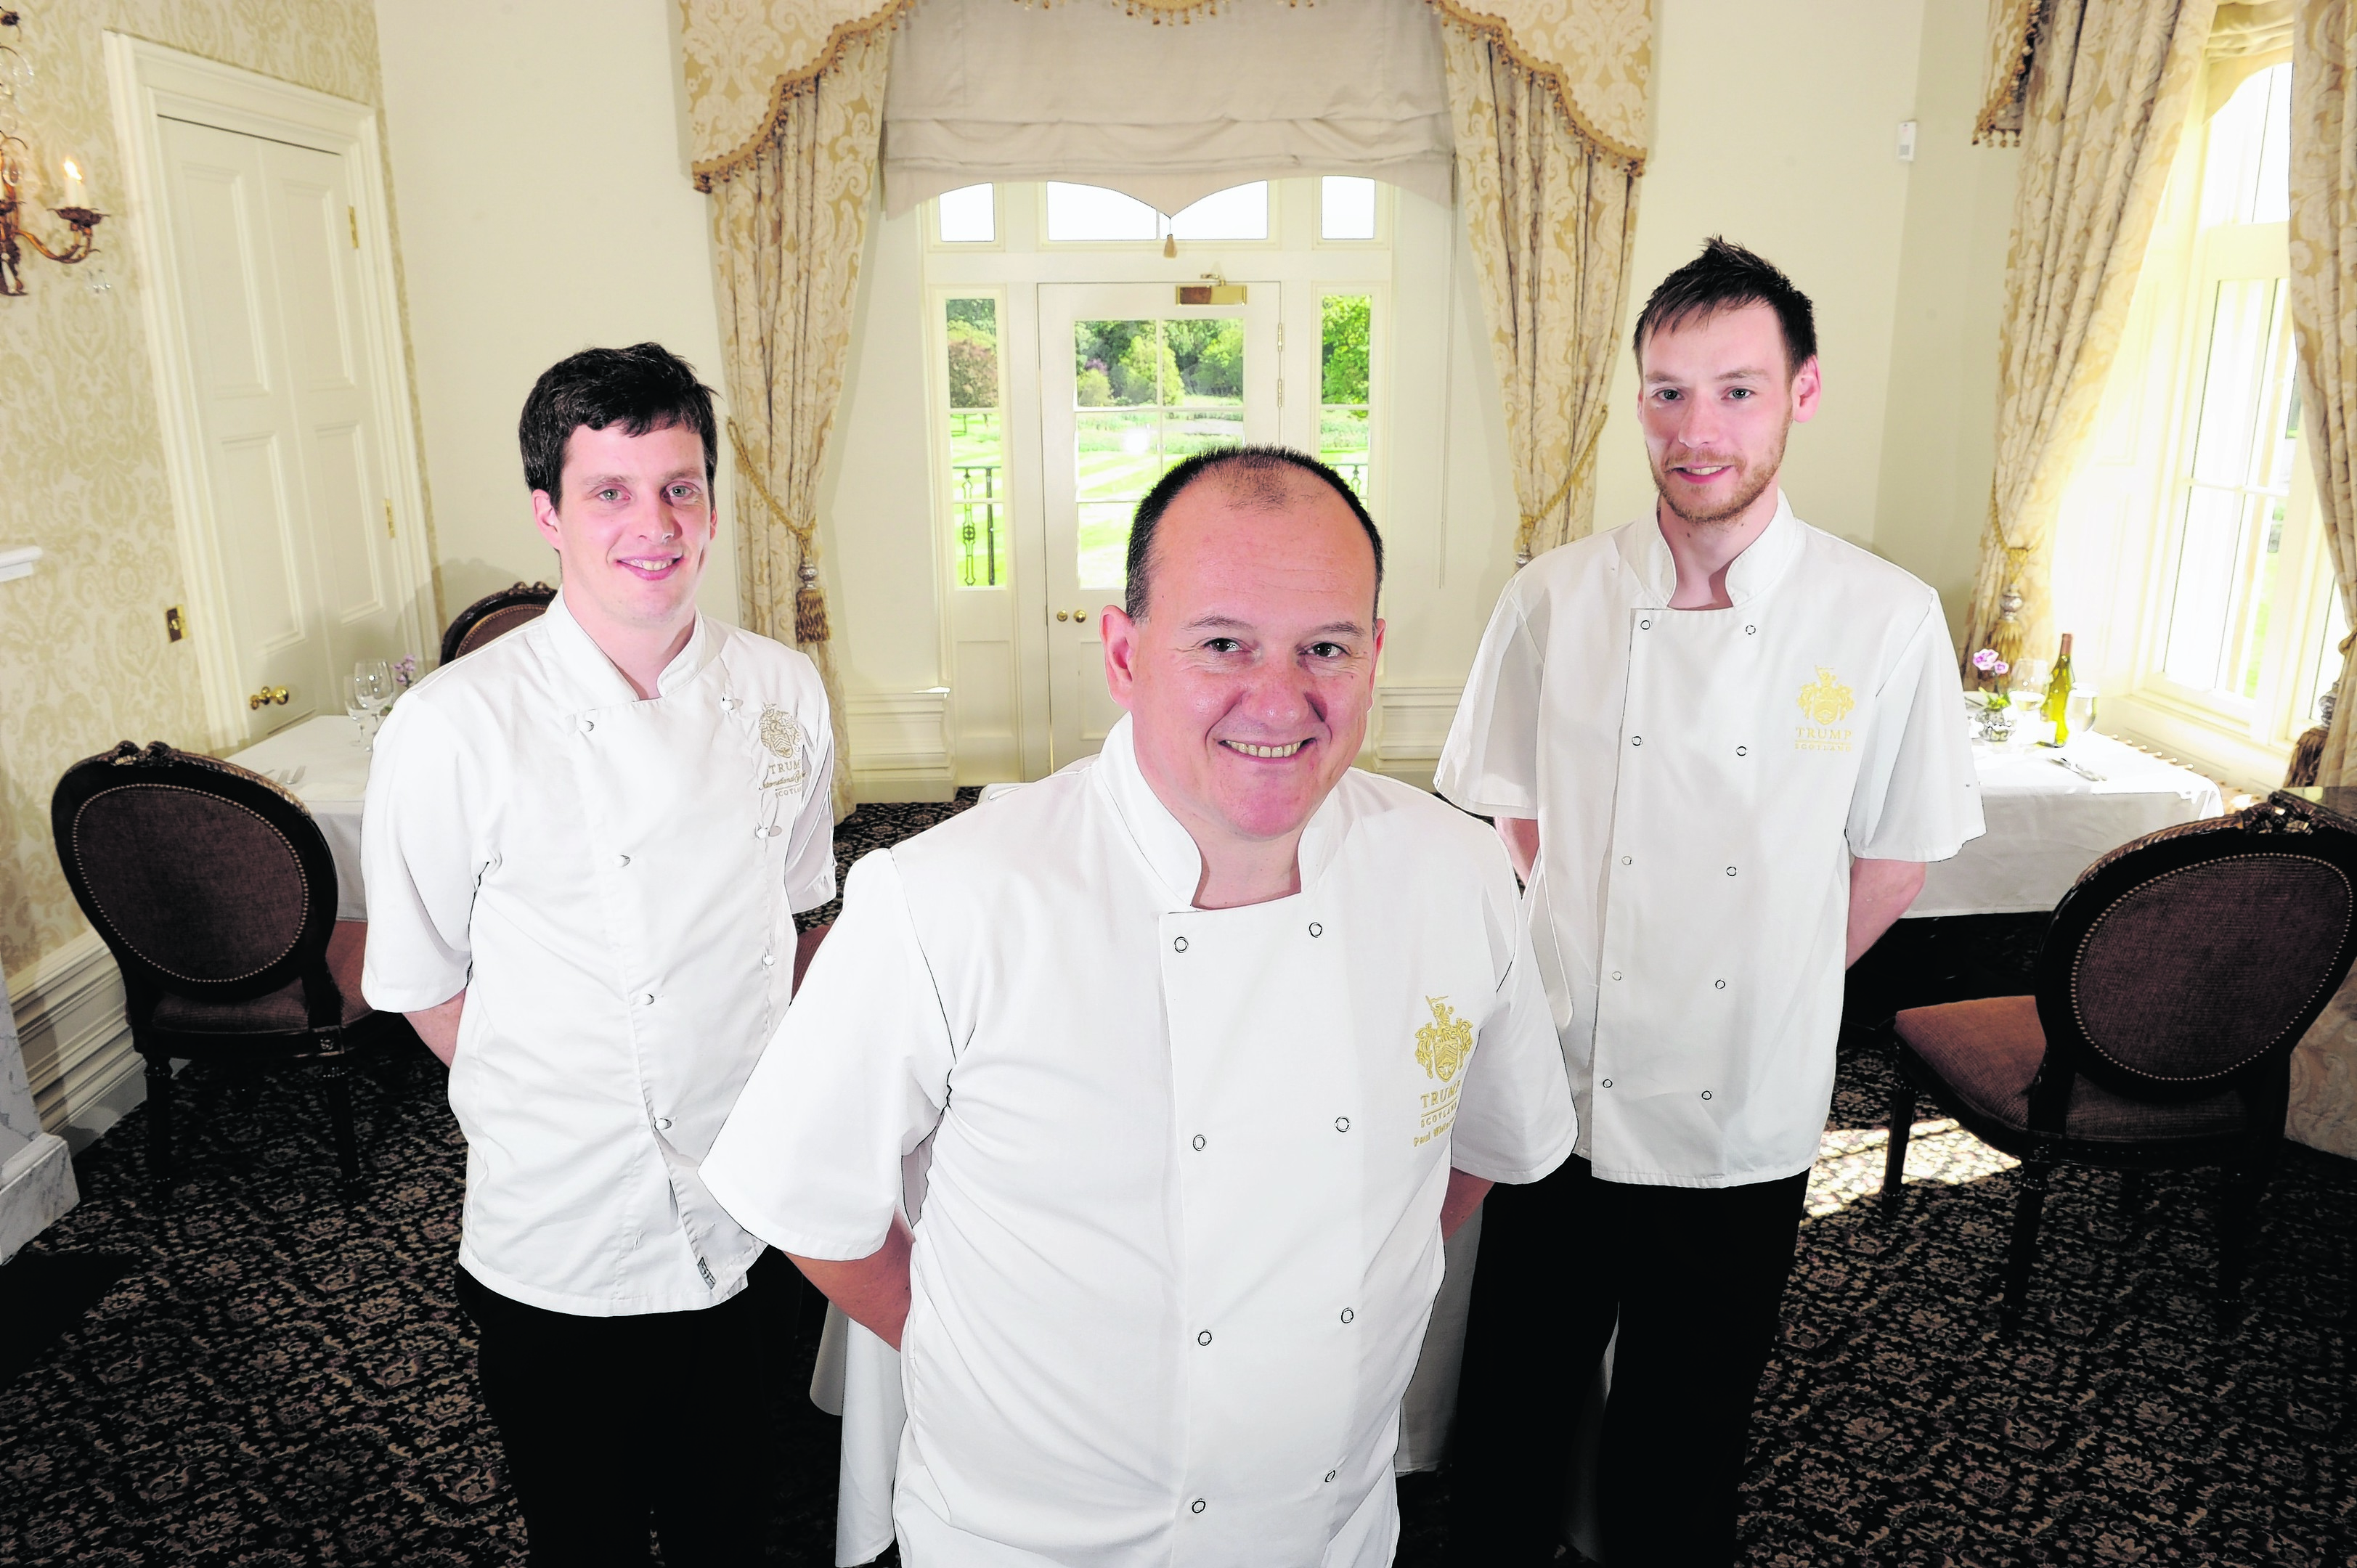 Trump International Golf Links Head Chef Paul Whitecross (centre) with chefs Tom Christie (left) and Blair Goodsir